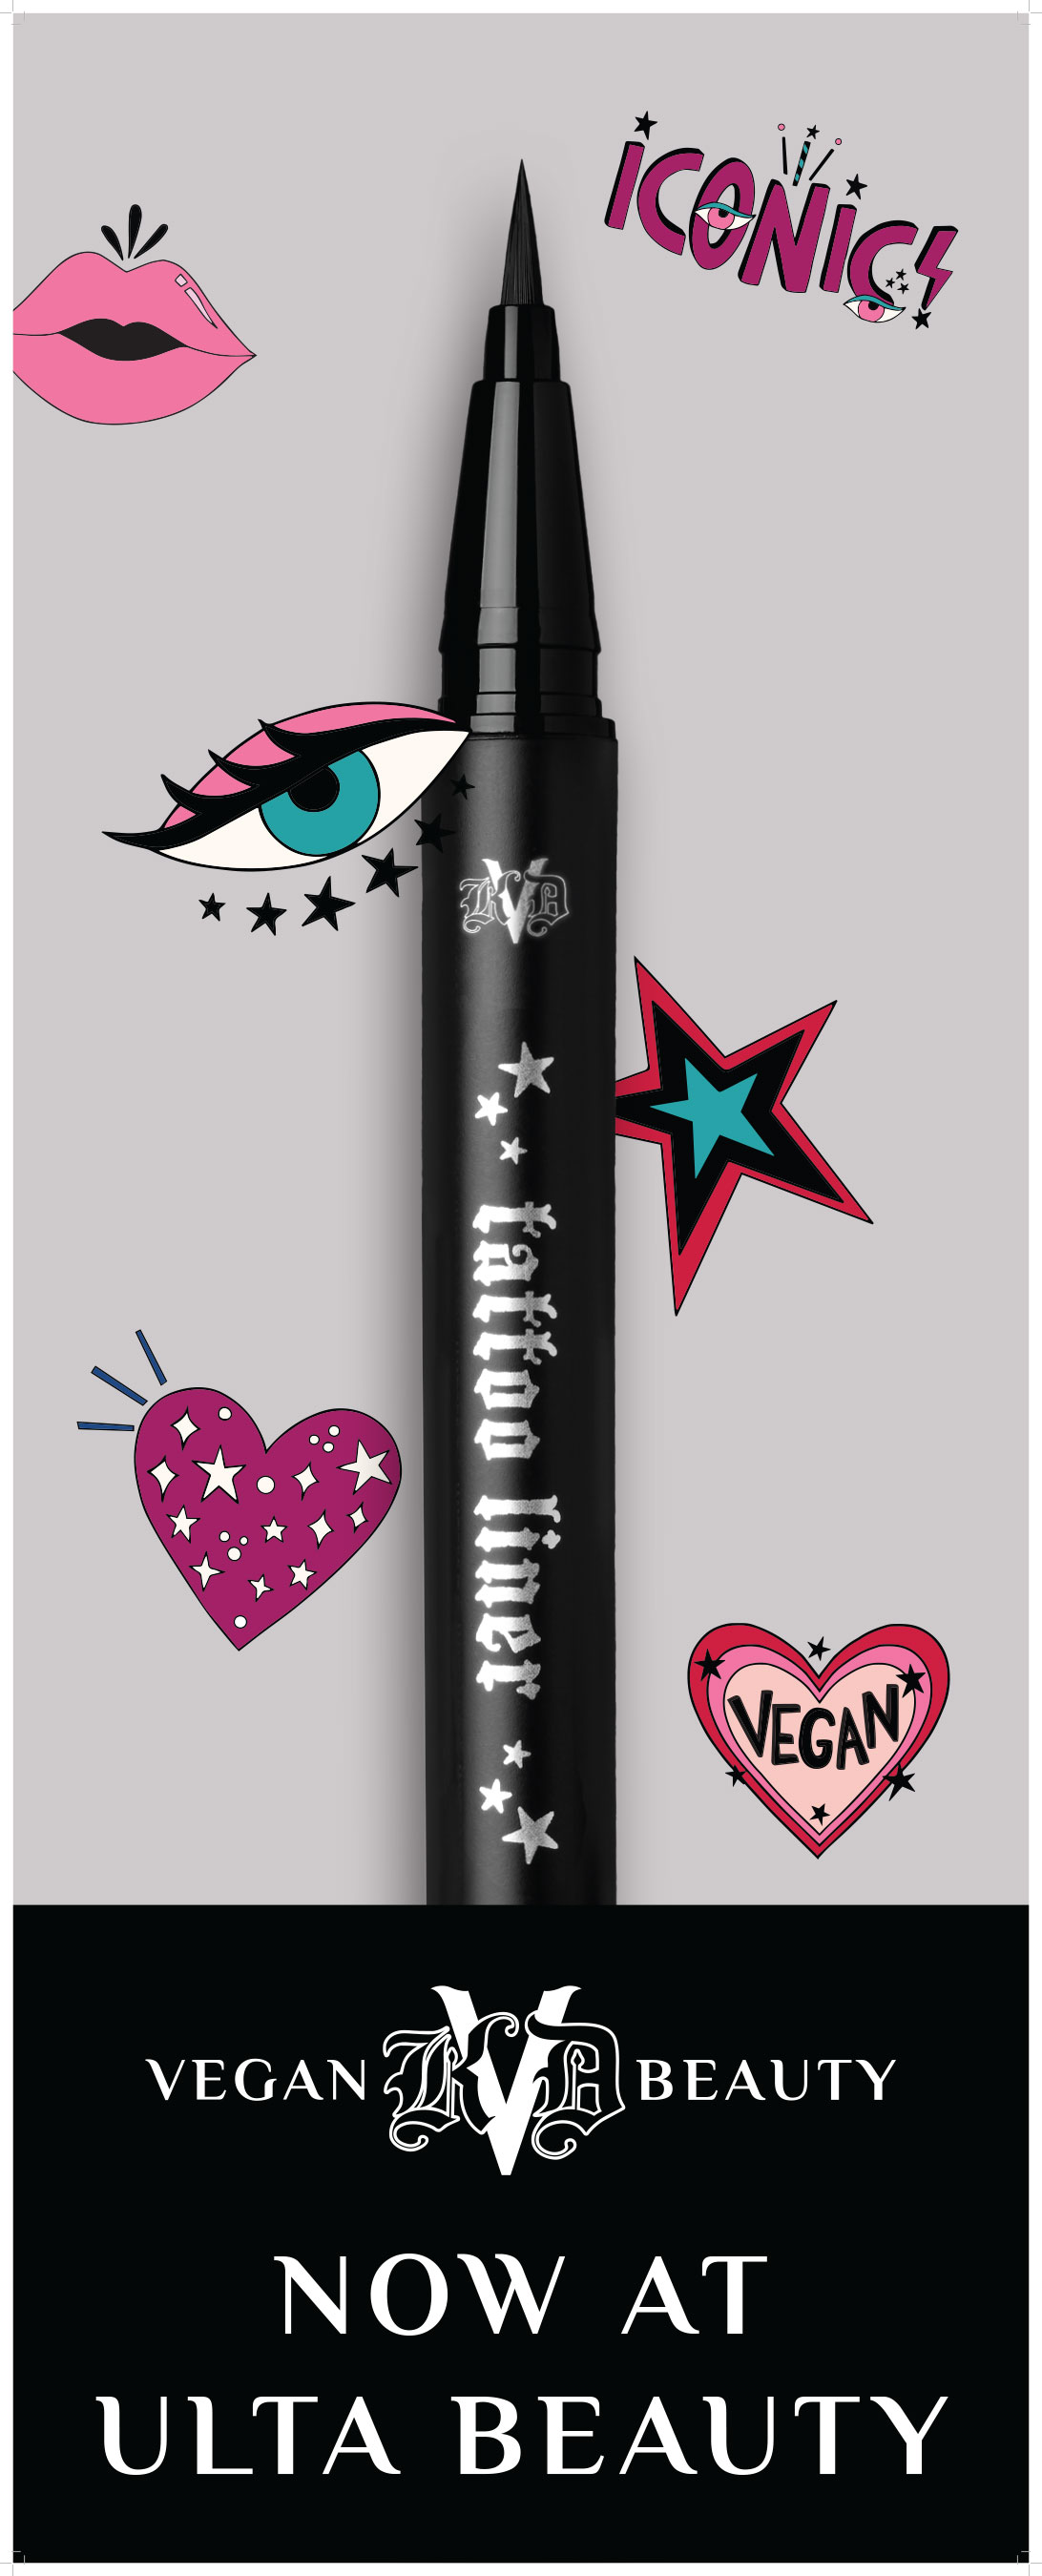 KVD Vegan Beauty's #1 product, Globally Award-Winning Liquid Eyeliner, Tattoo Liner - and First Vegan Product